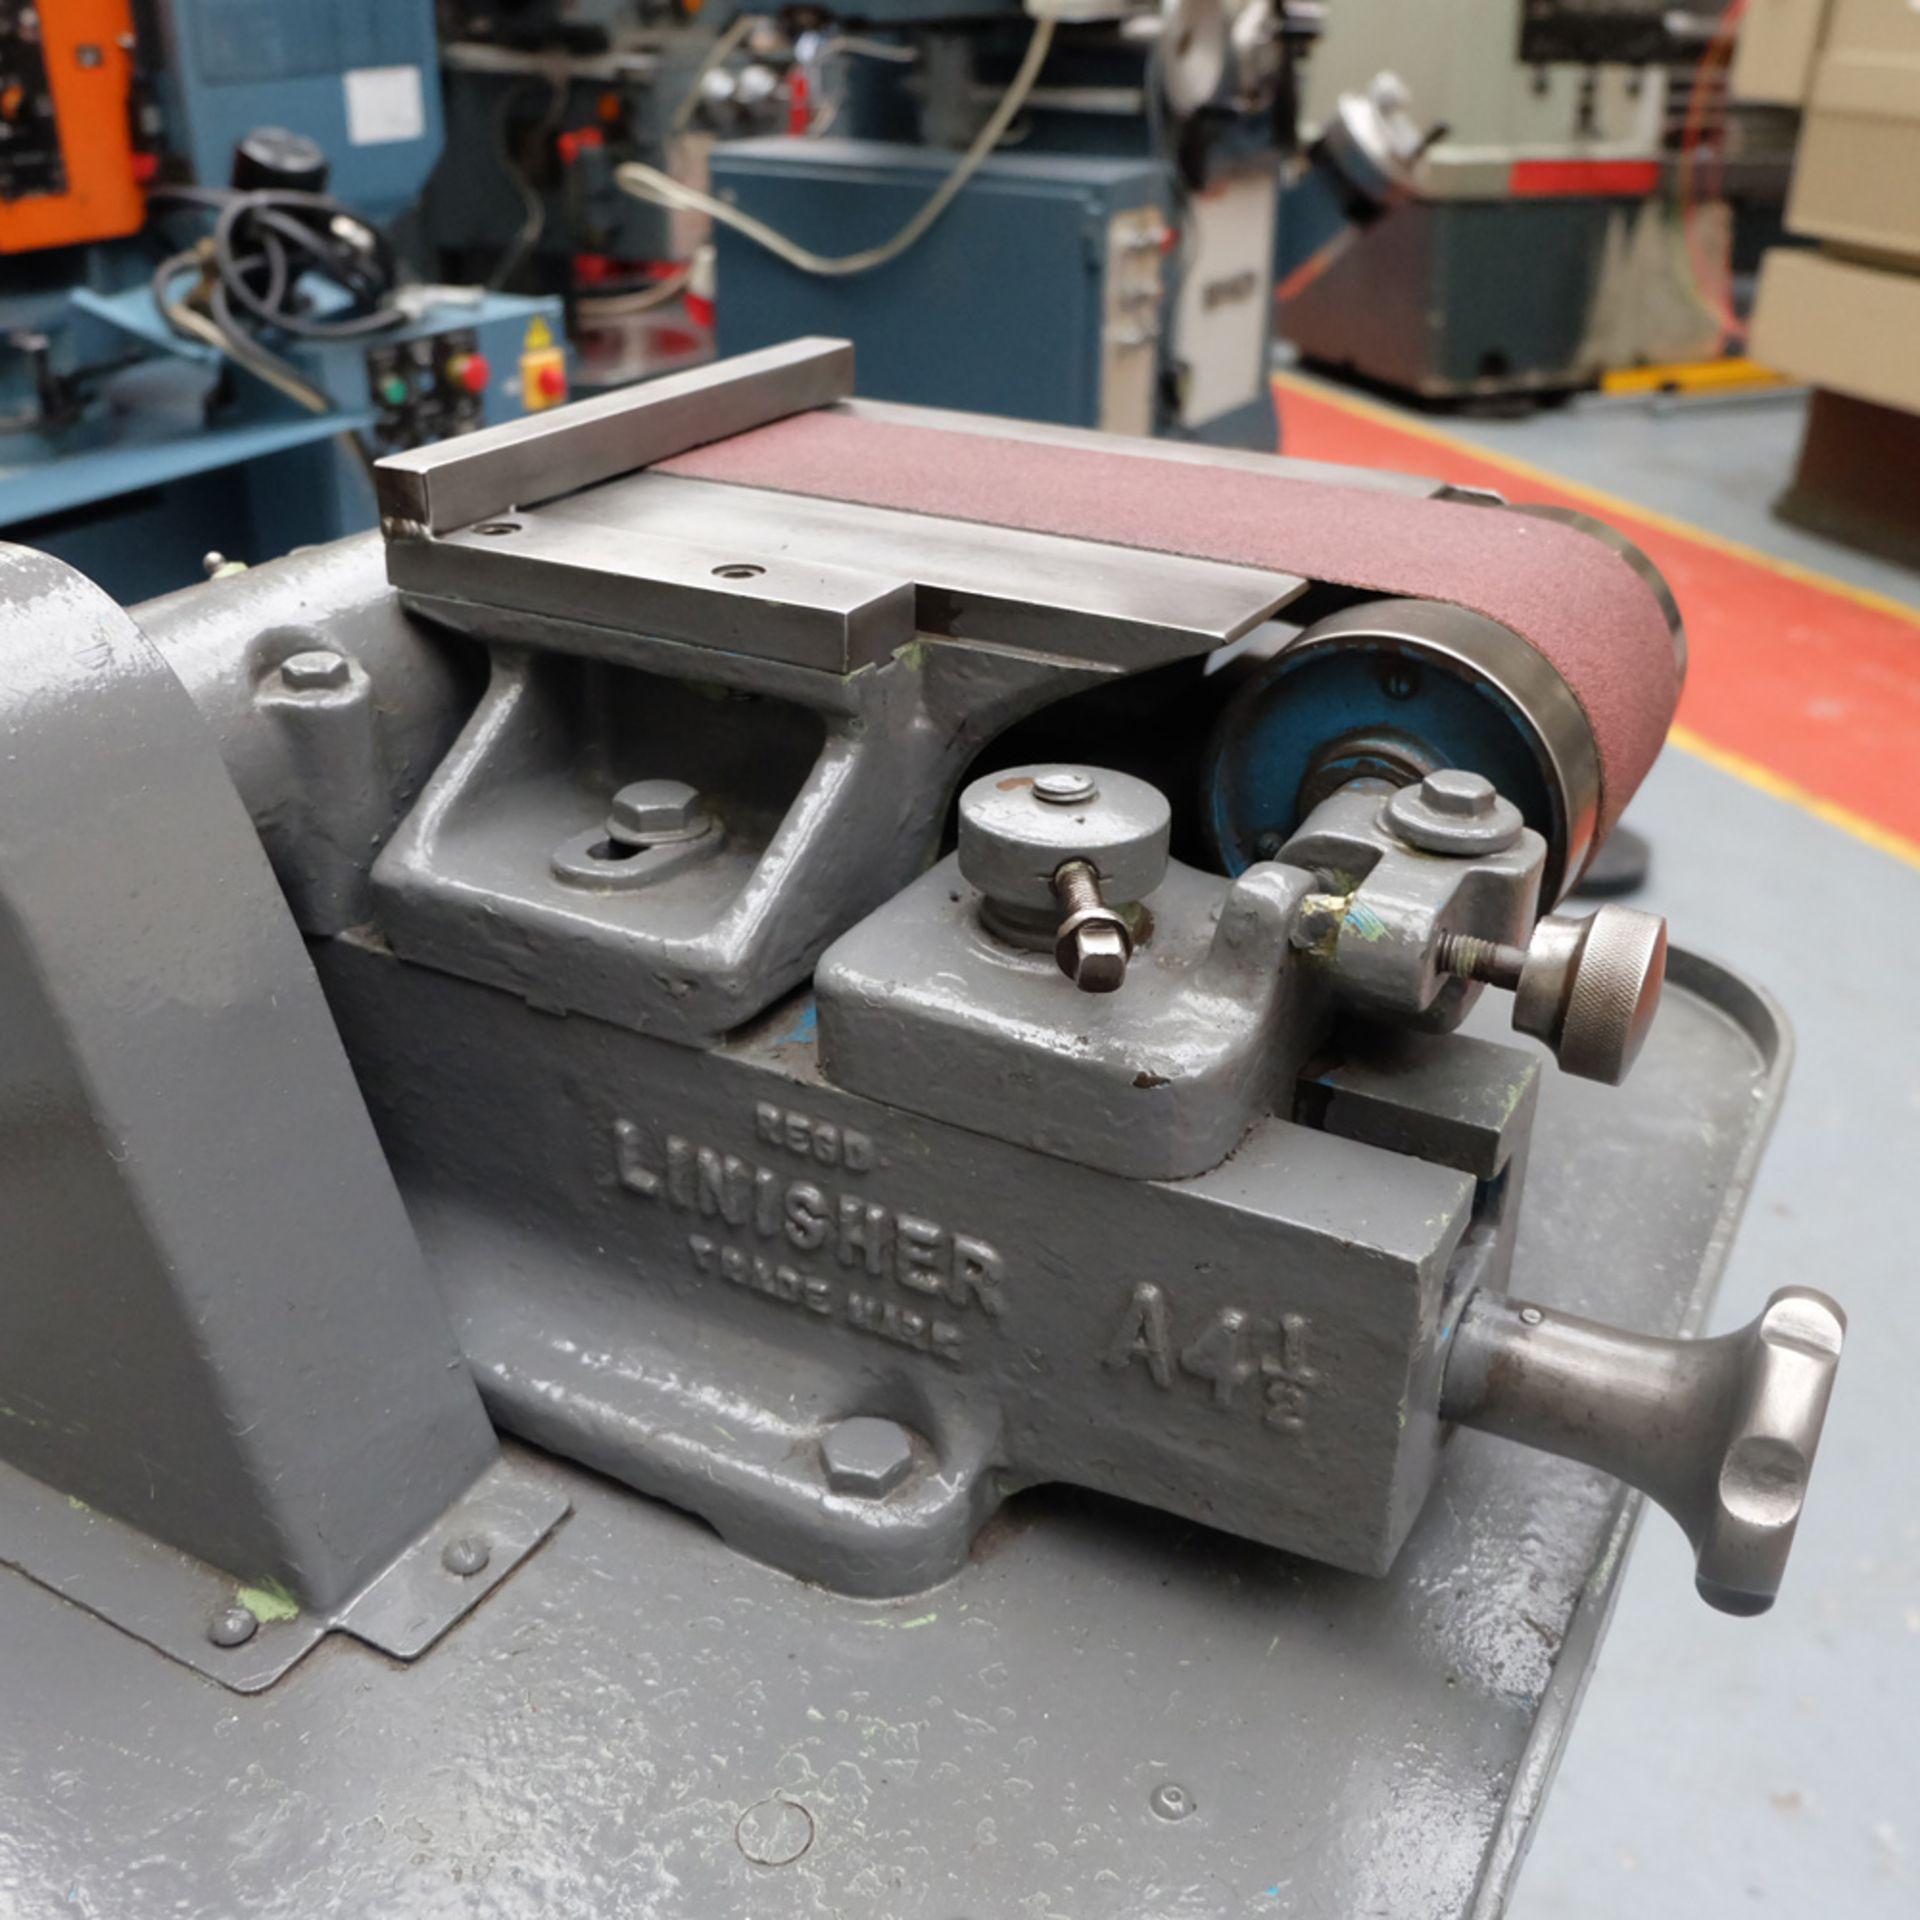 Morrisflex Model A4 1/2 Horizontal Linisher on Heavy Duty Steel Table. - Image 4 of 6